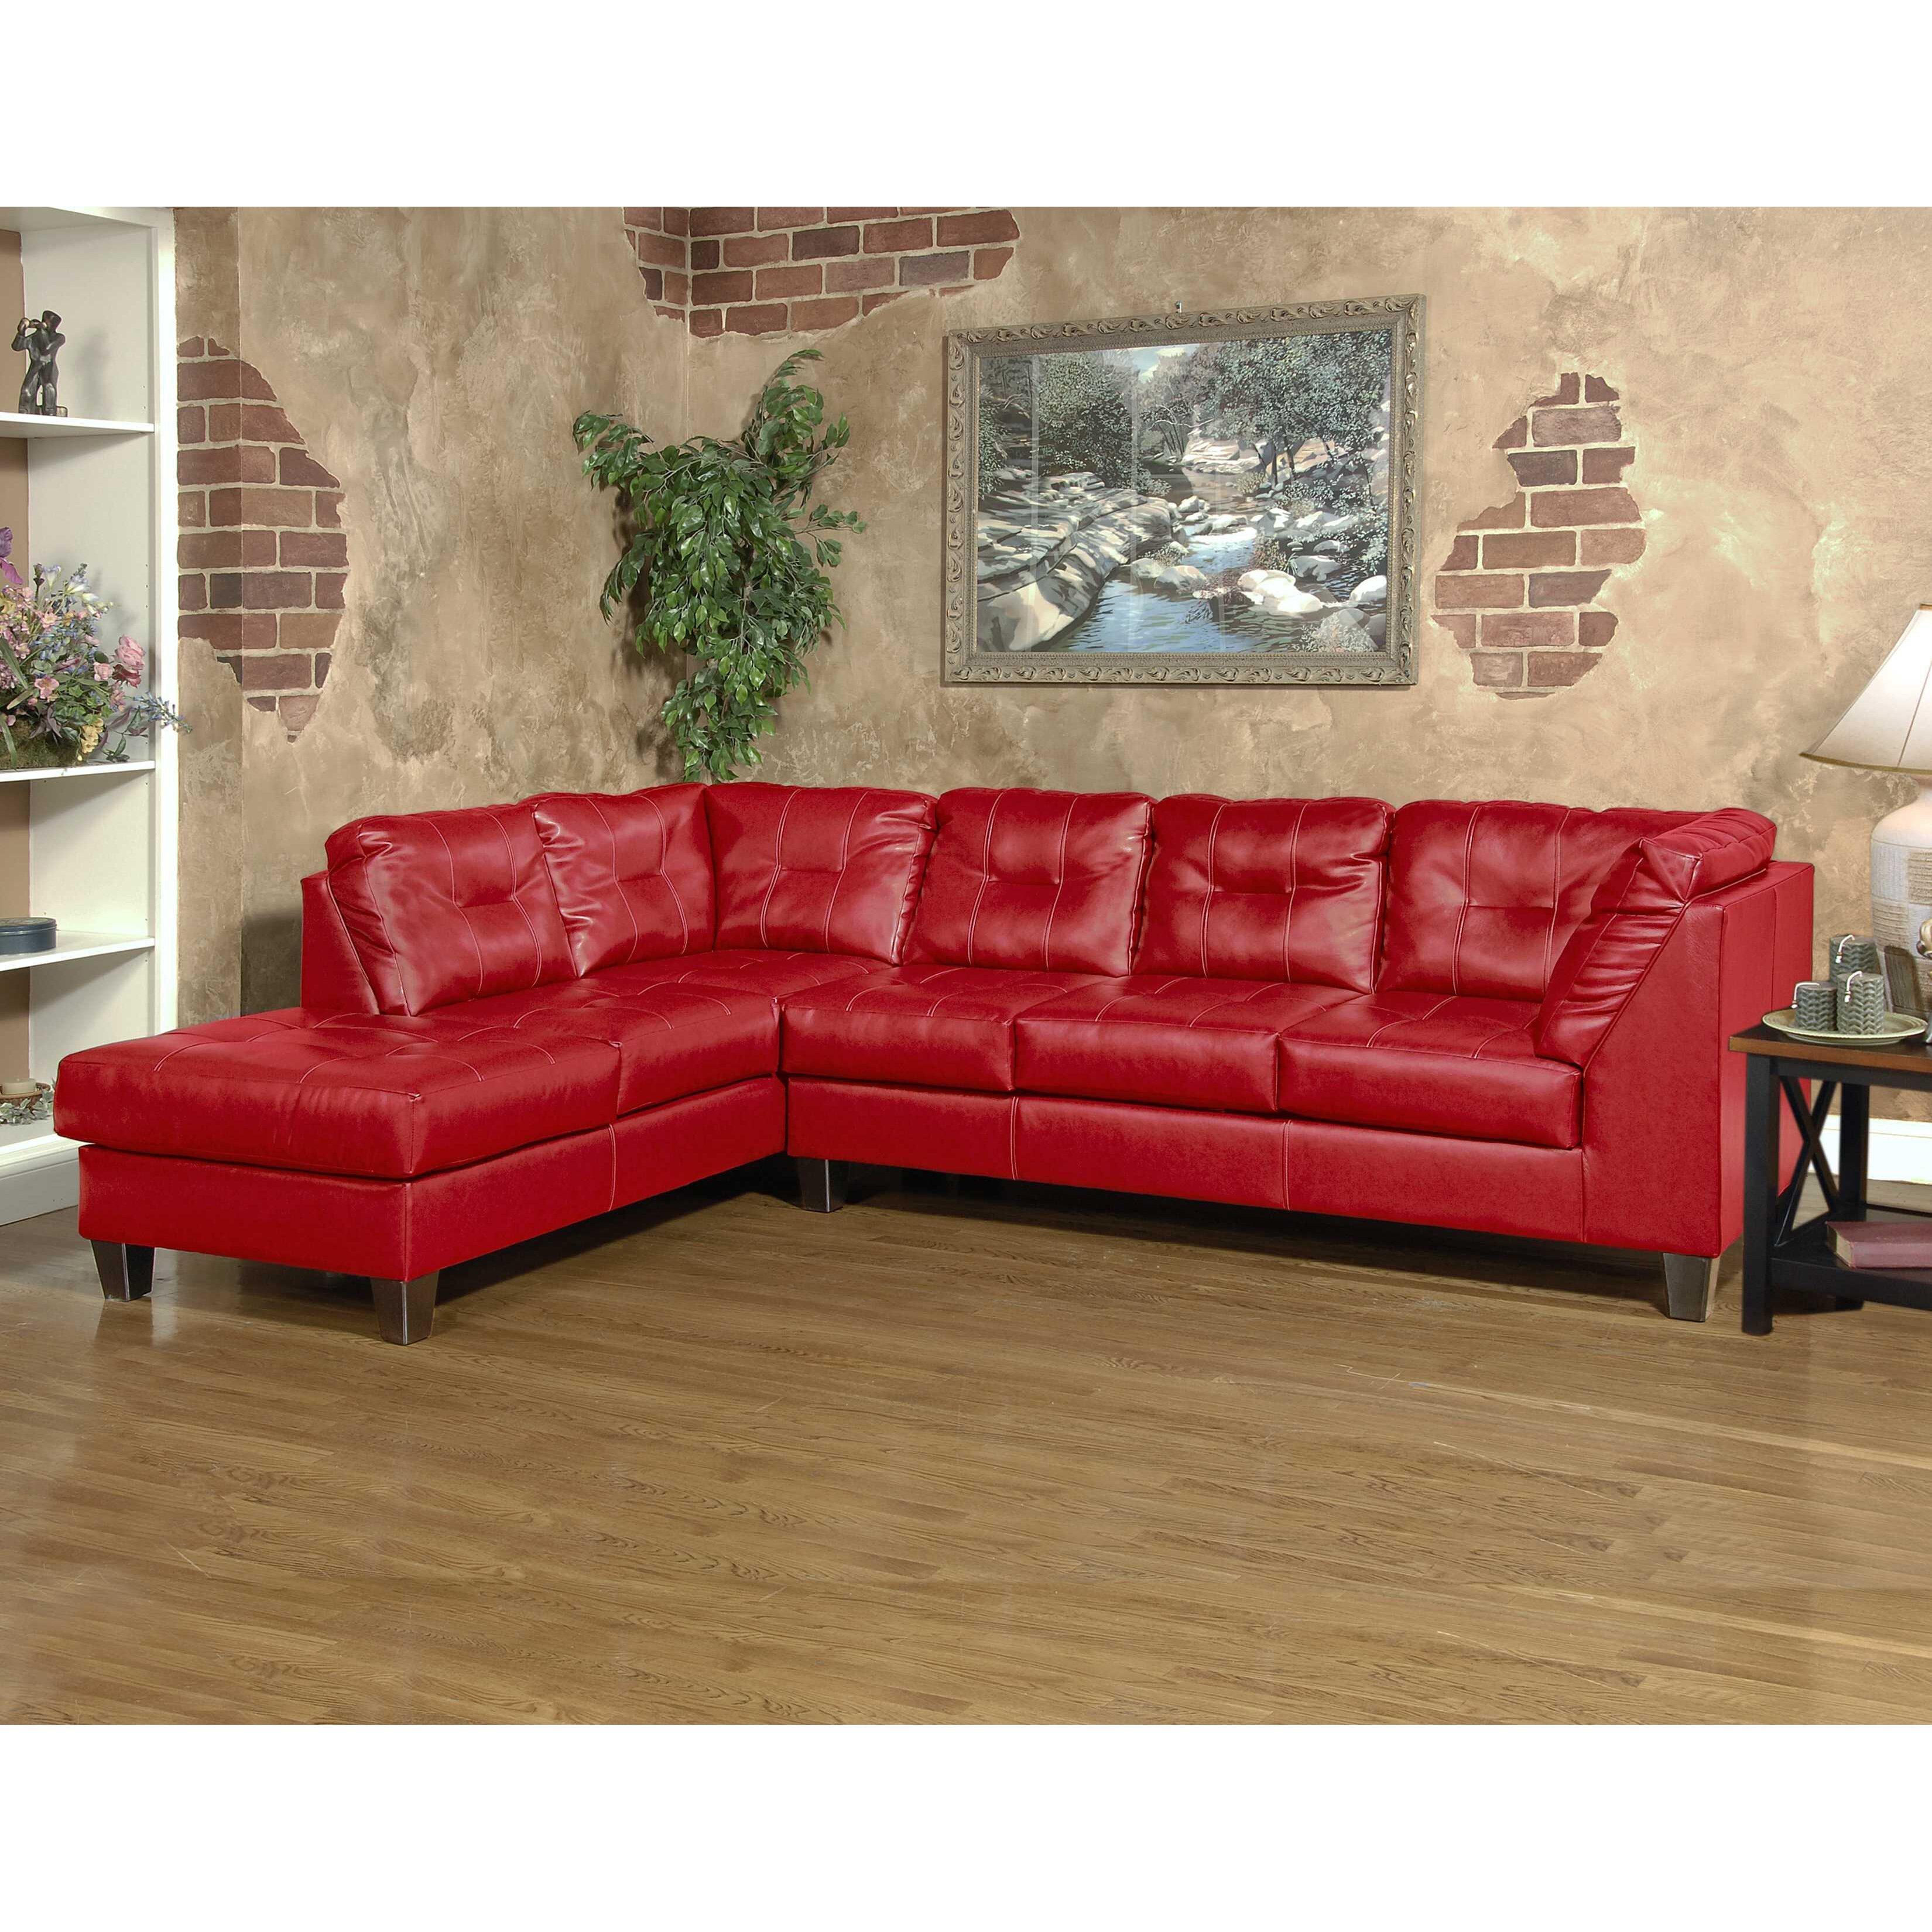 Serta Upholstery Sectional Amp Reviews Wayfair